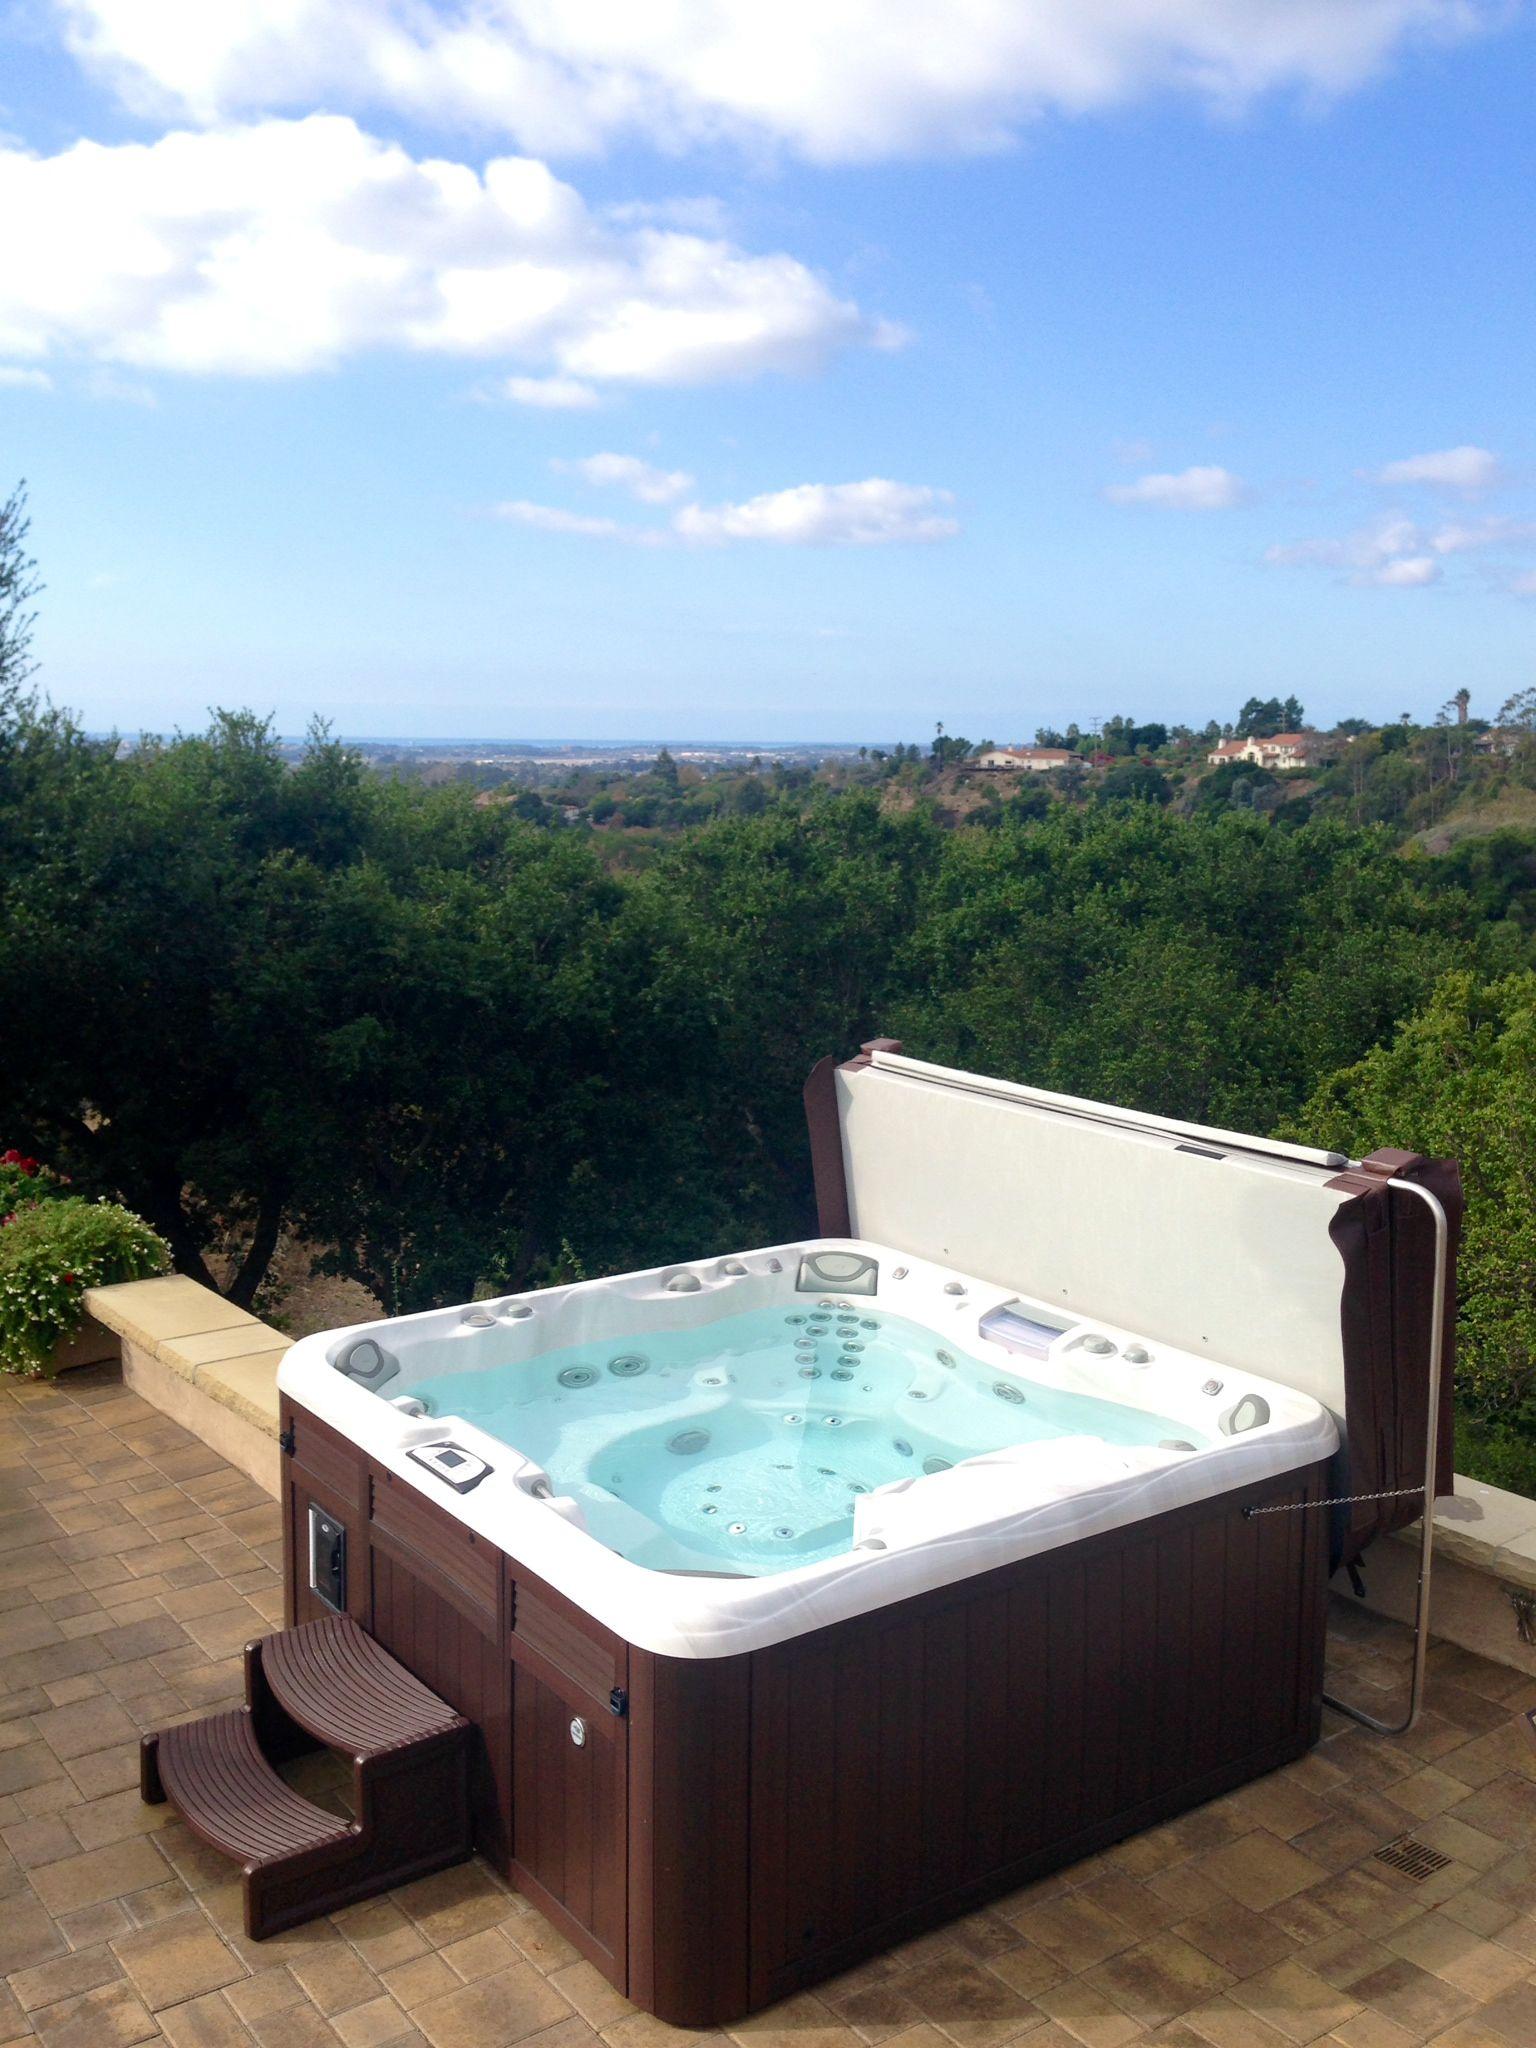 Sundance Spa Overlooking Santa Barbara Www Gordonandgrant Spas Jacuzzi Hot